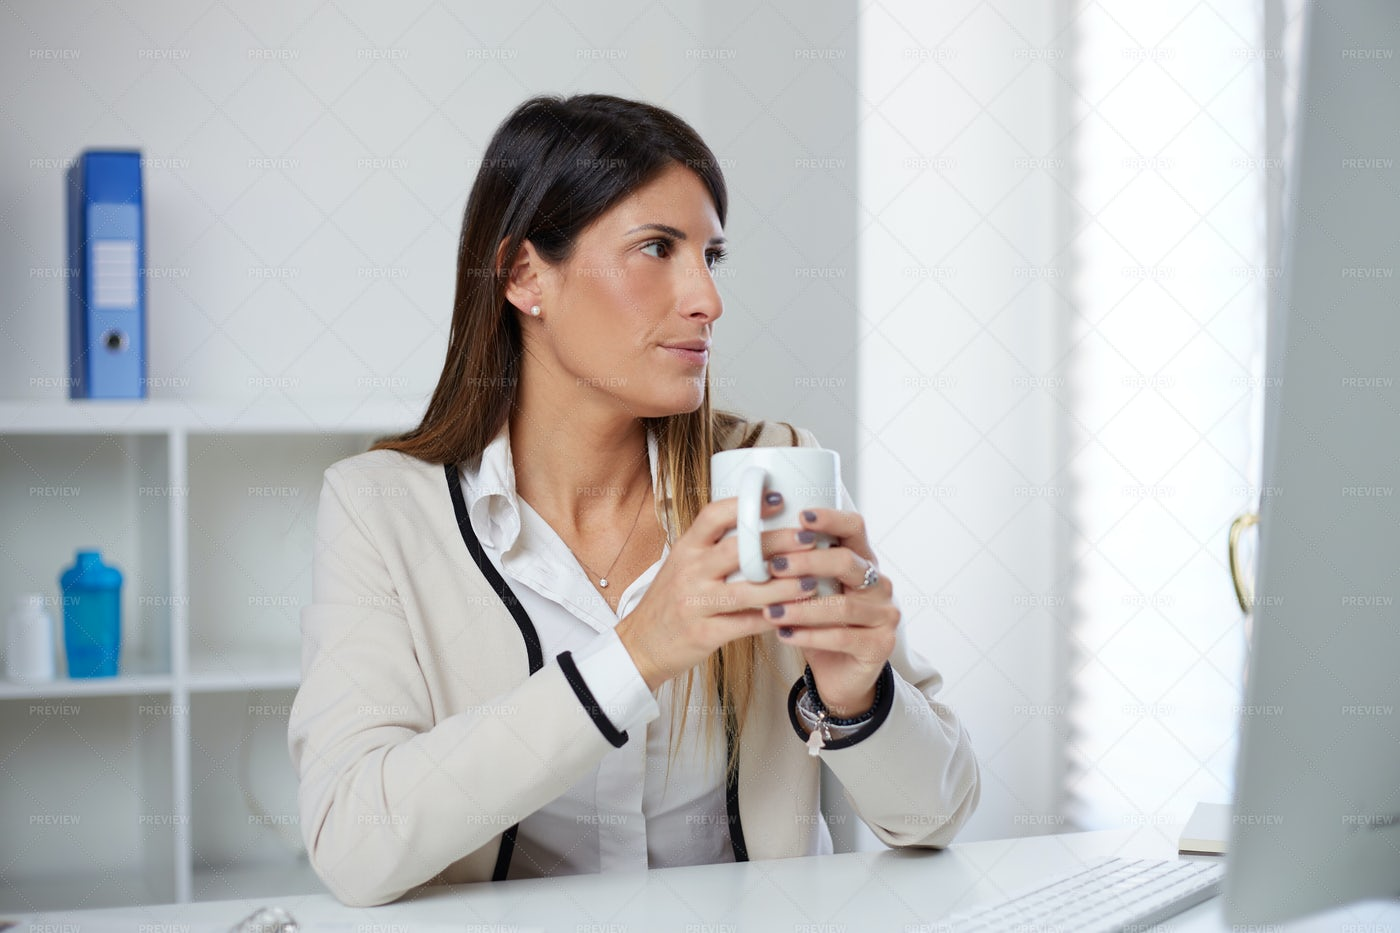 Woman Drinking Tea: Stock Photos